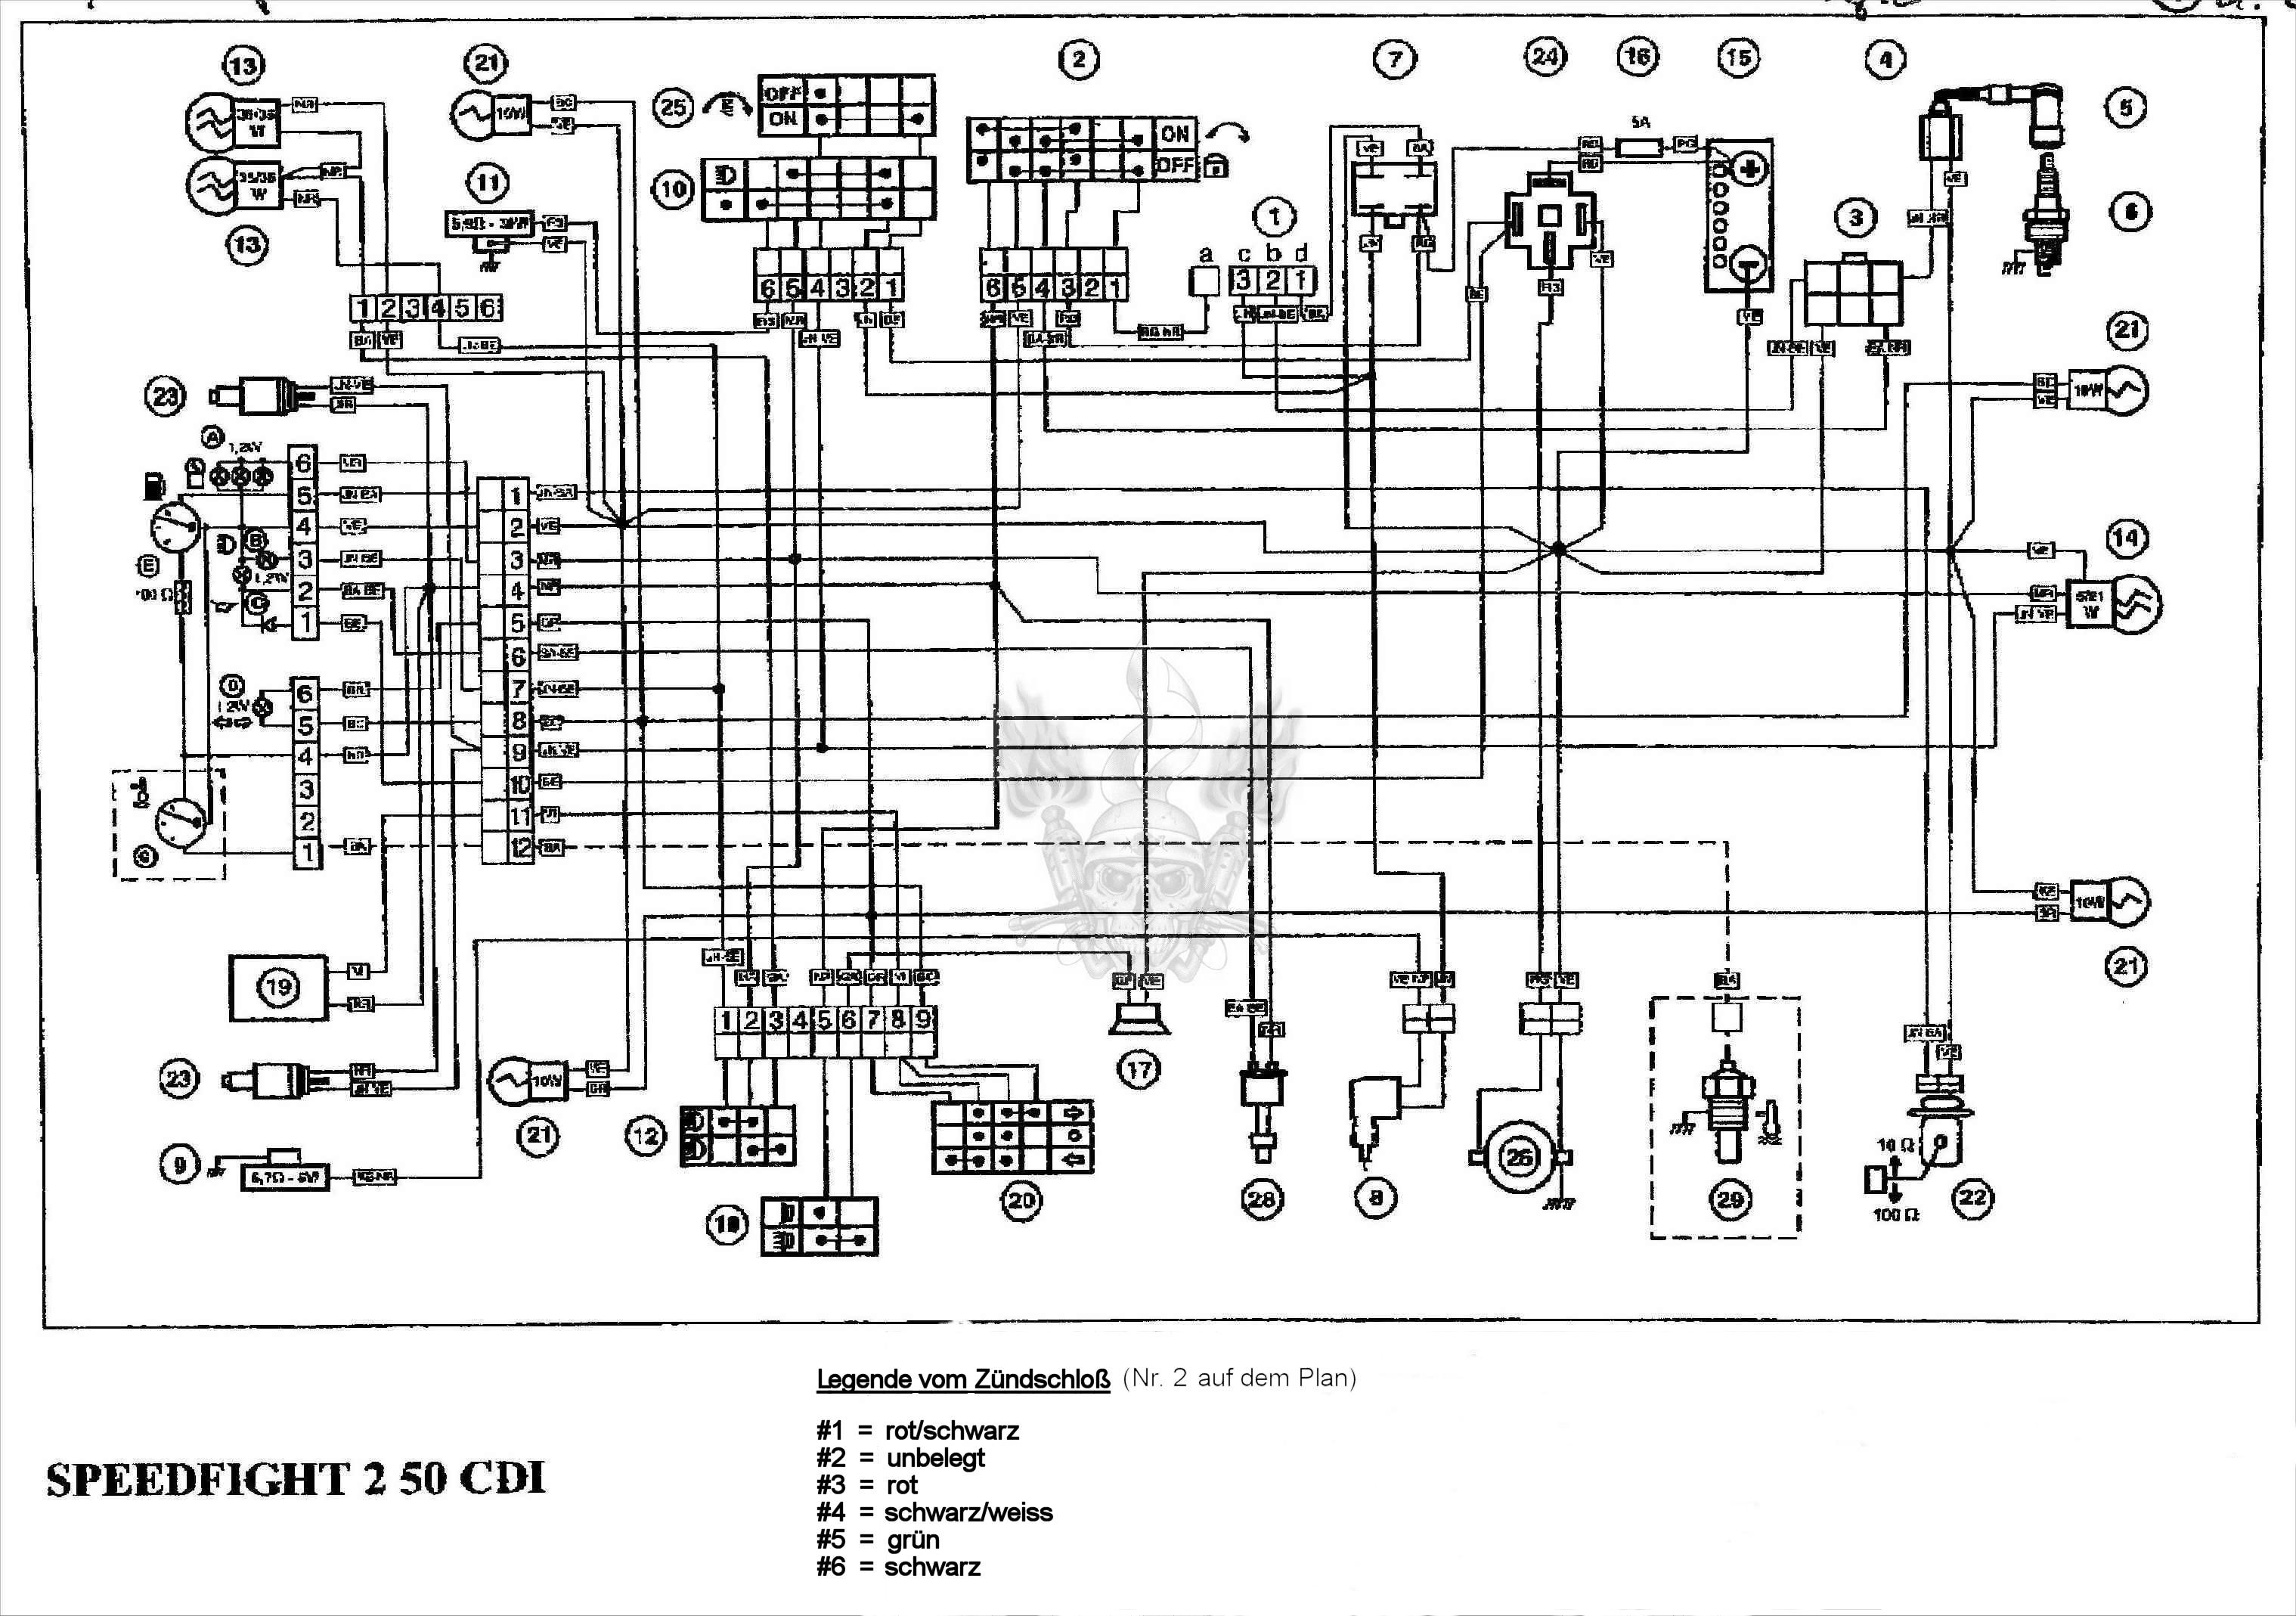 Ducati Ignition Module Wiring Diagram Trusted Schematics Circuit Diagrams Wire U2022 4 Pin Hei Schematic